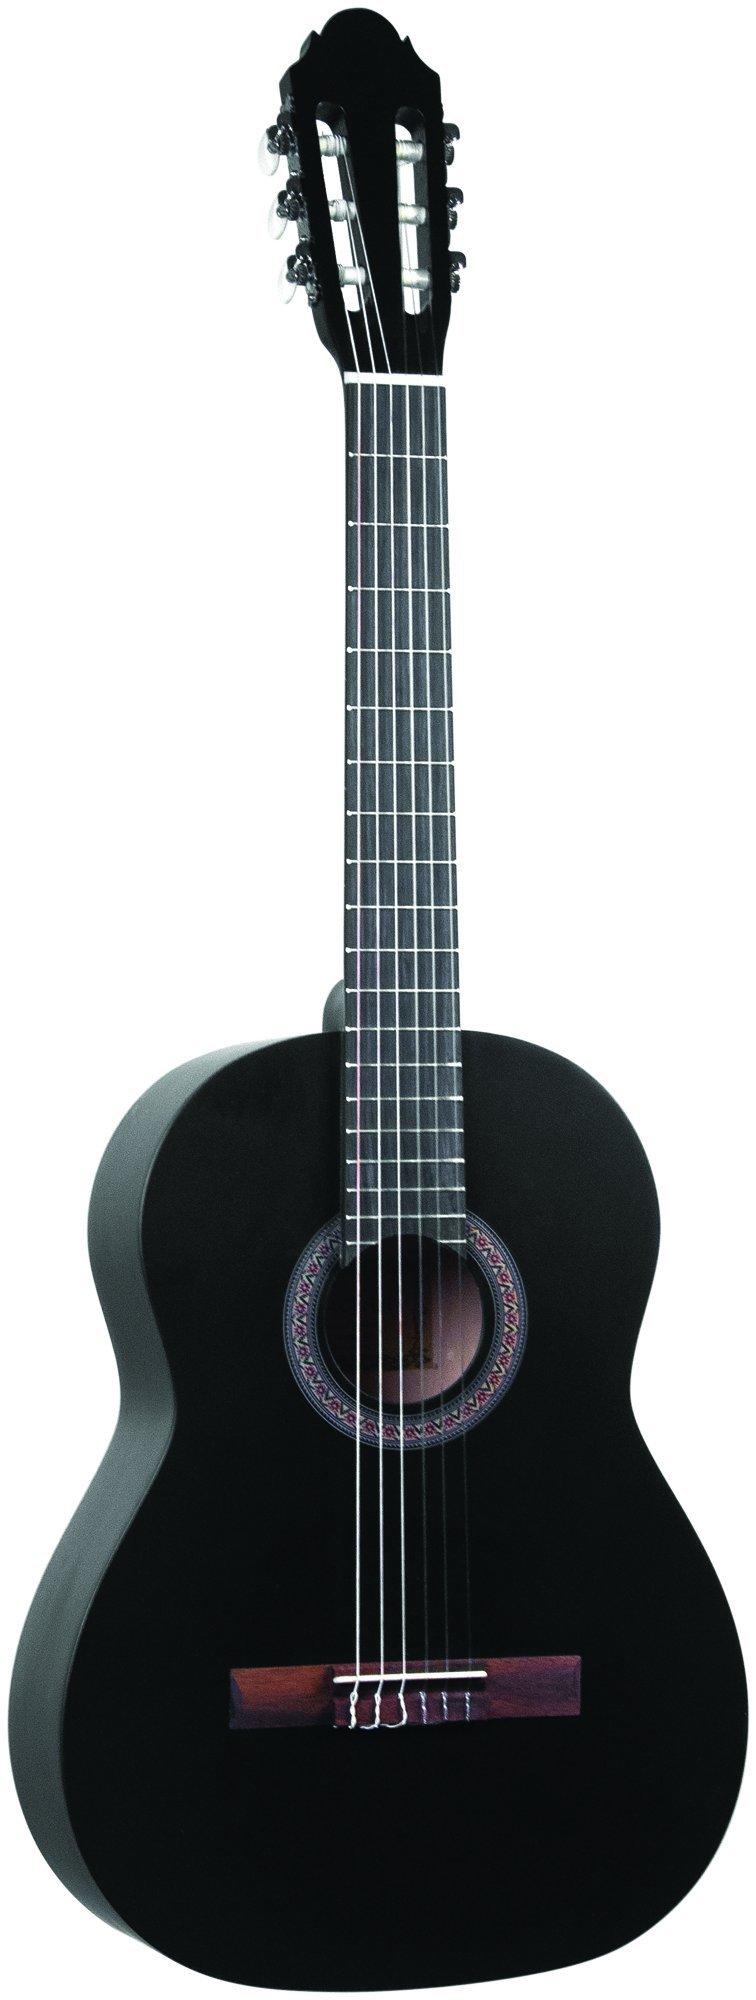 Lucida LG-400-1/2BK Student Classical Guitar, Black, 1/2 Size